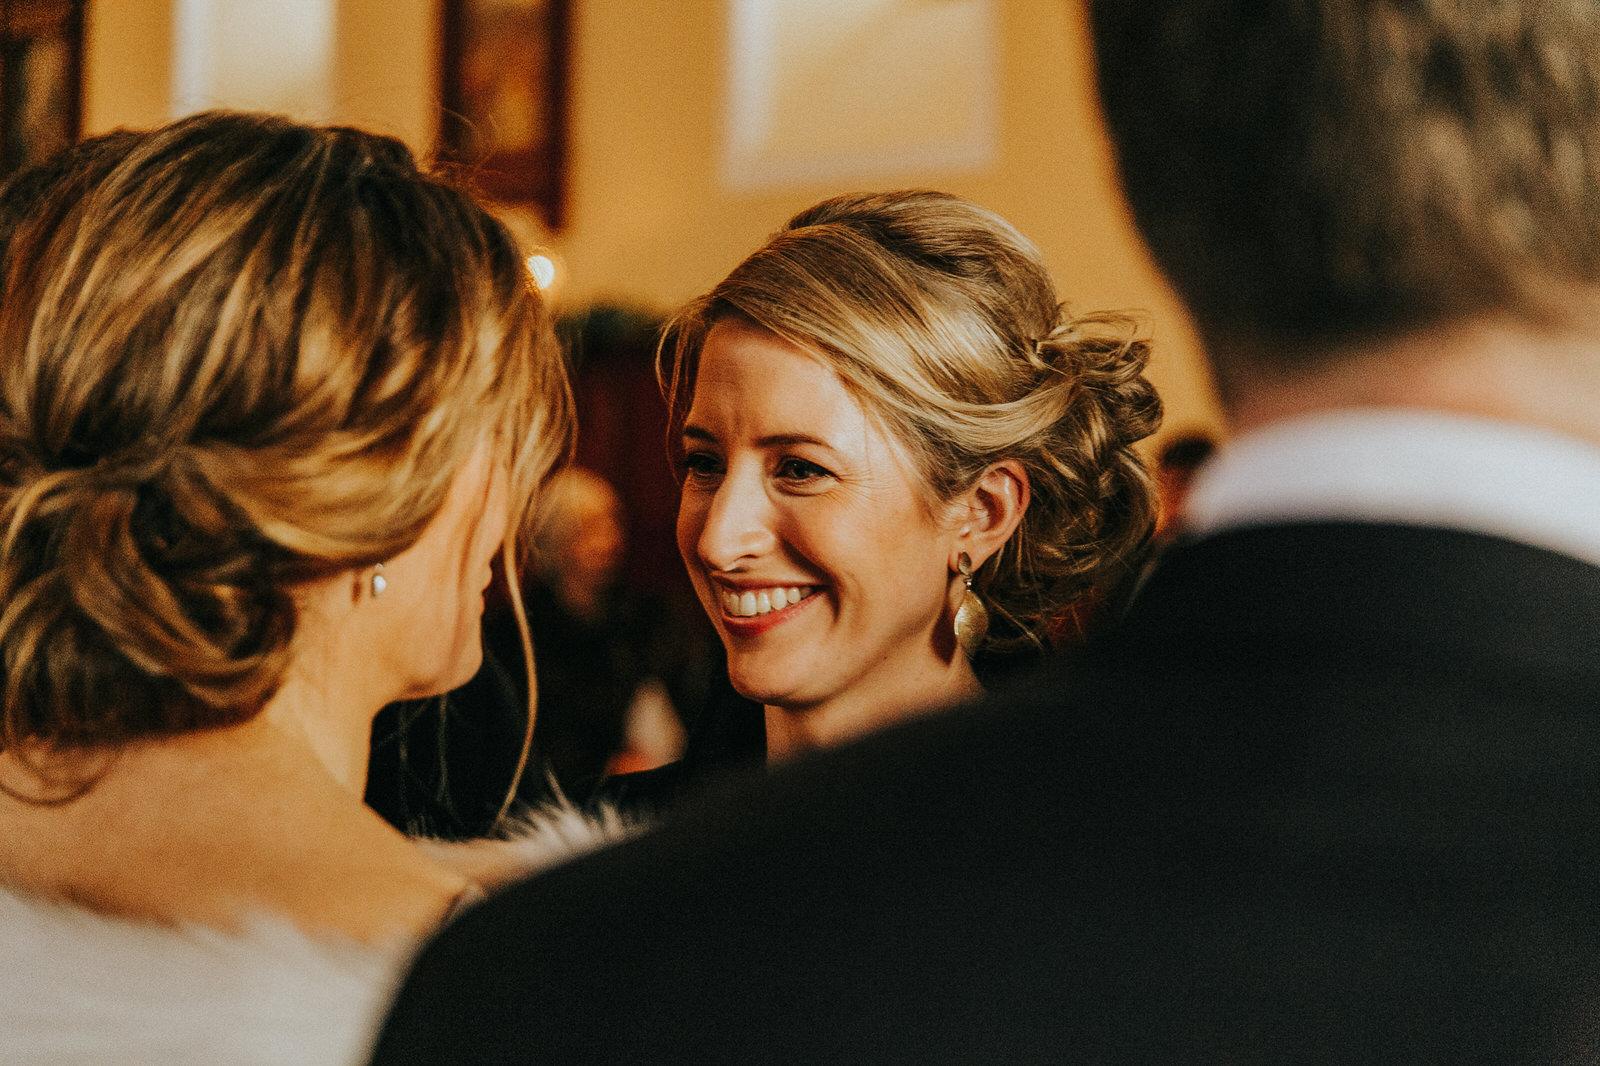 Dunbrody_House_Wedding_photographer_092.jpg